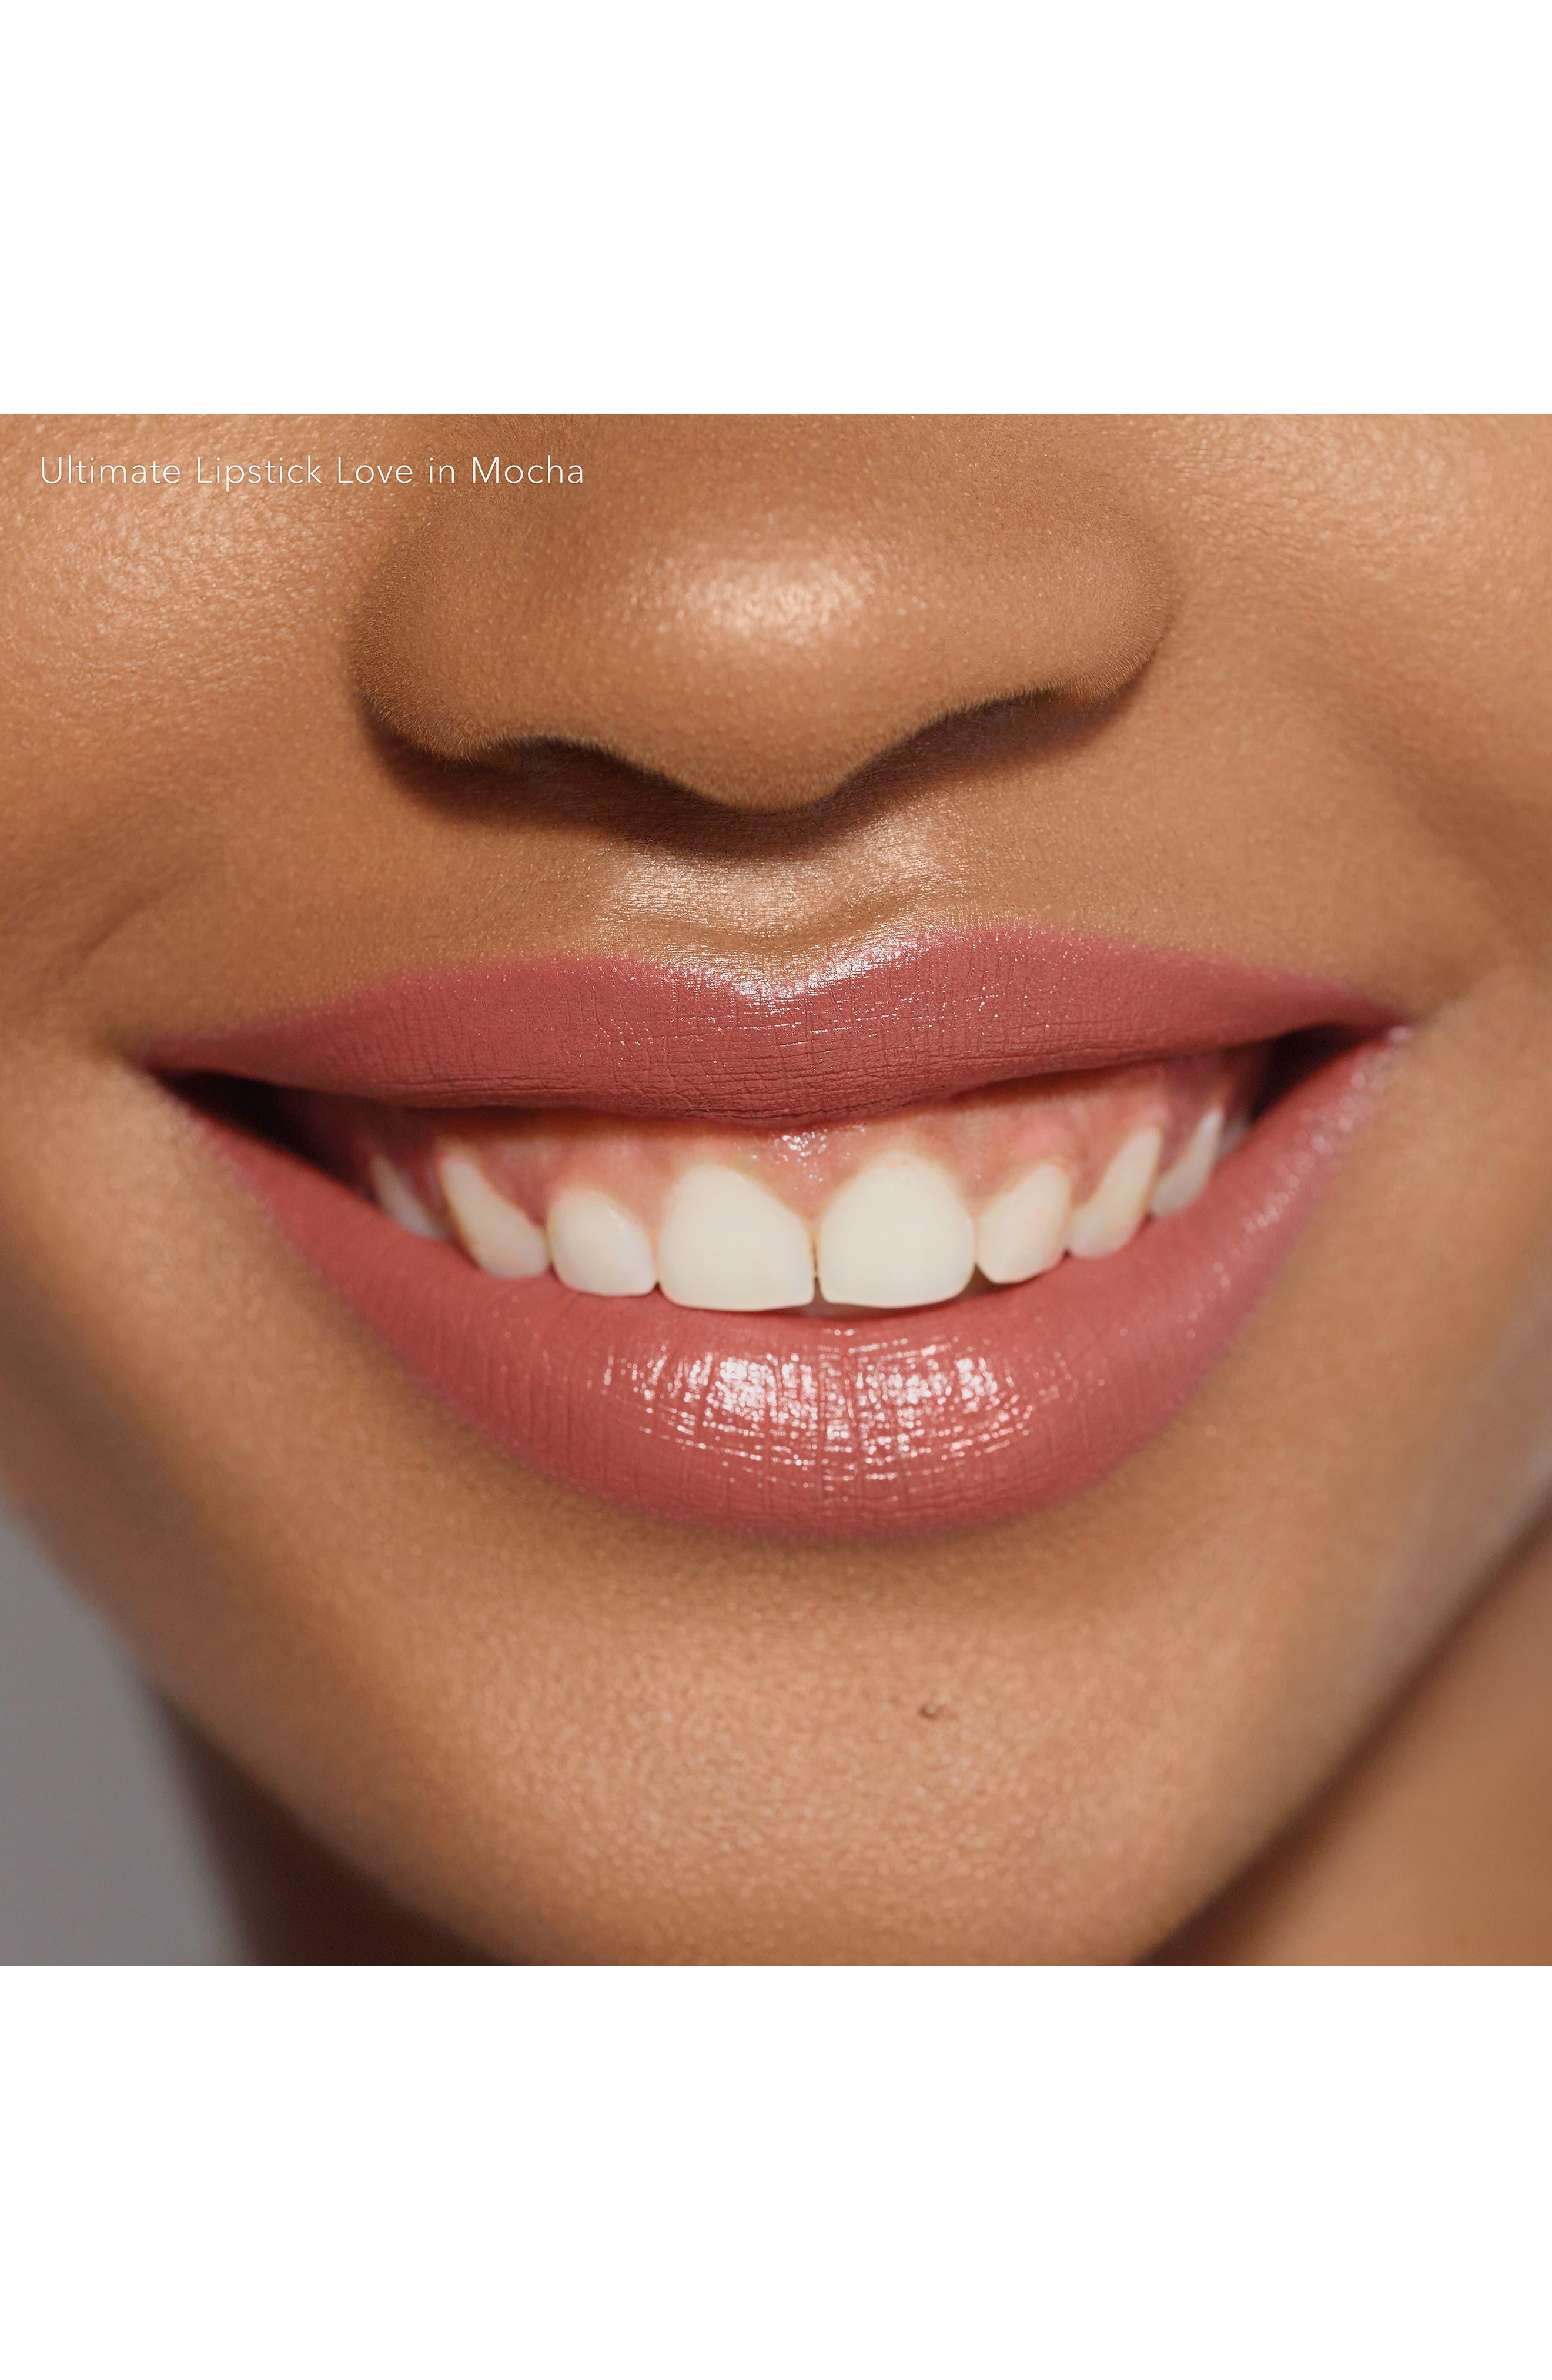 BECCA COSMETICS,                             BECCA Ultimate Lipstick Love,                             Alternate thumbnail 2, color,                             MOCHA